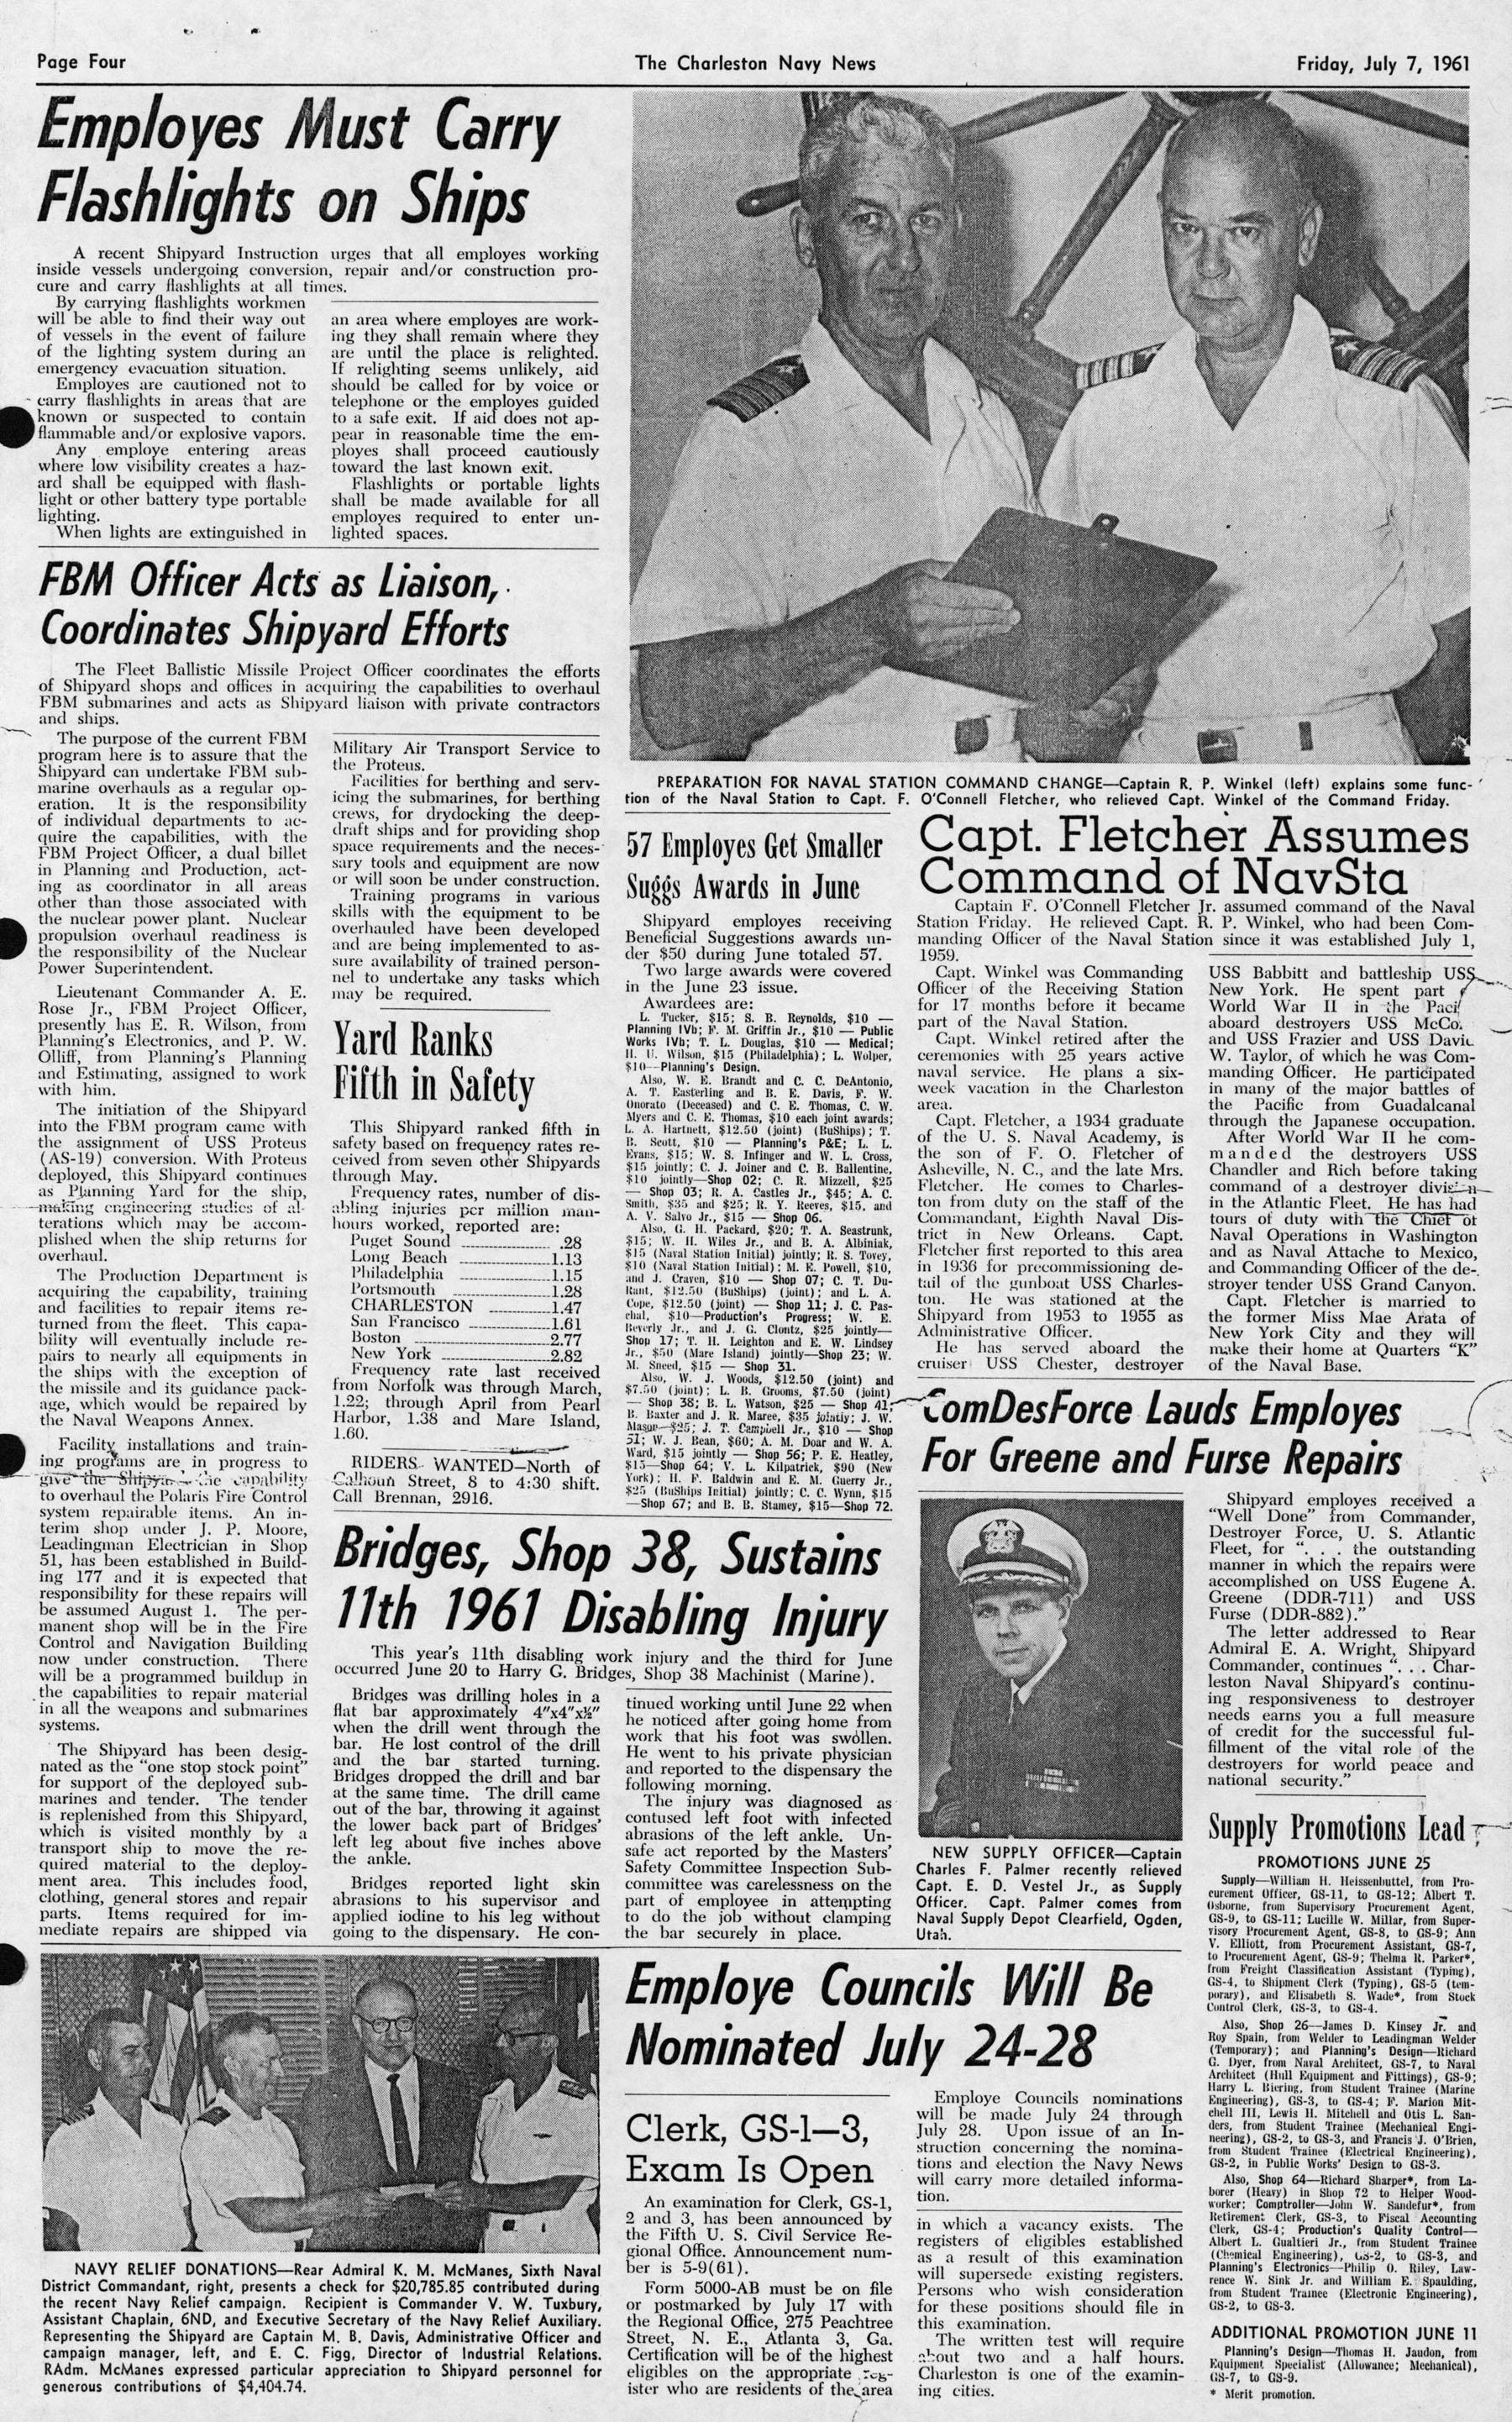 The Charleston Navy News, Volume 20, Edition 1, page iv